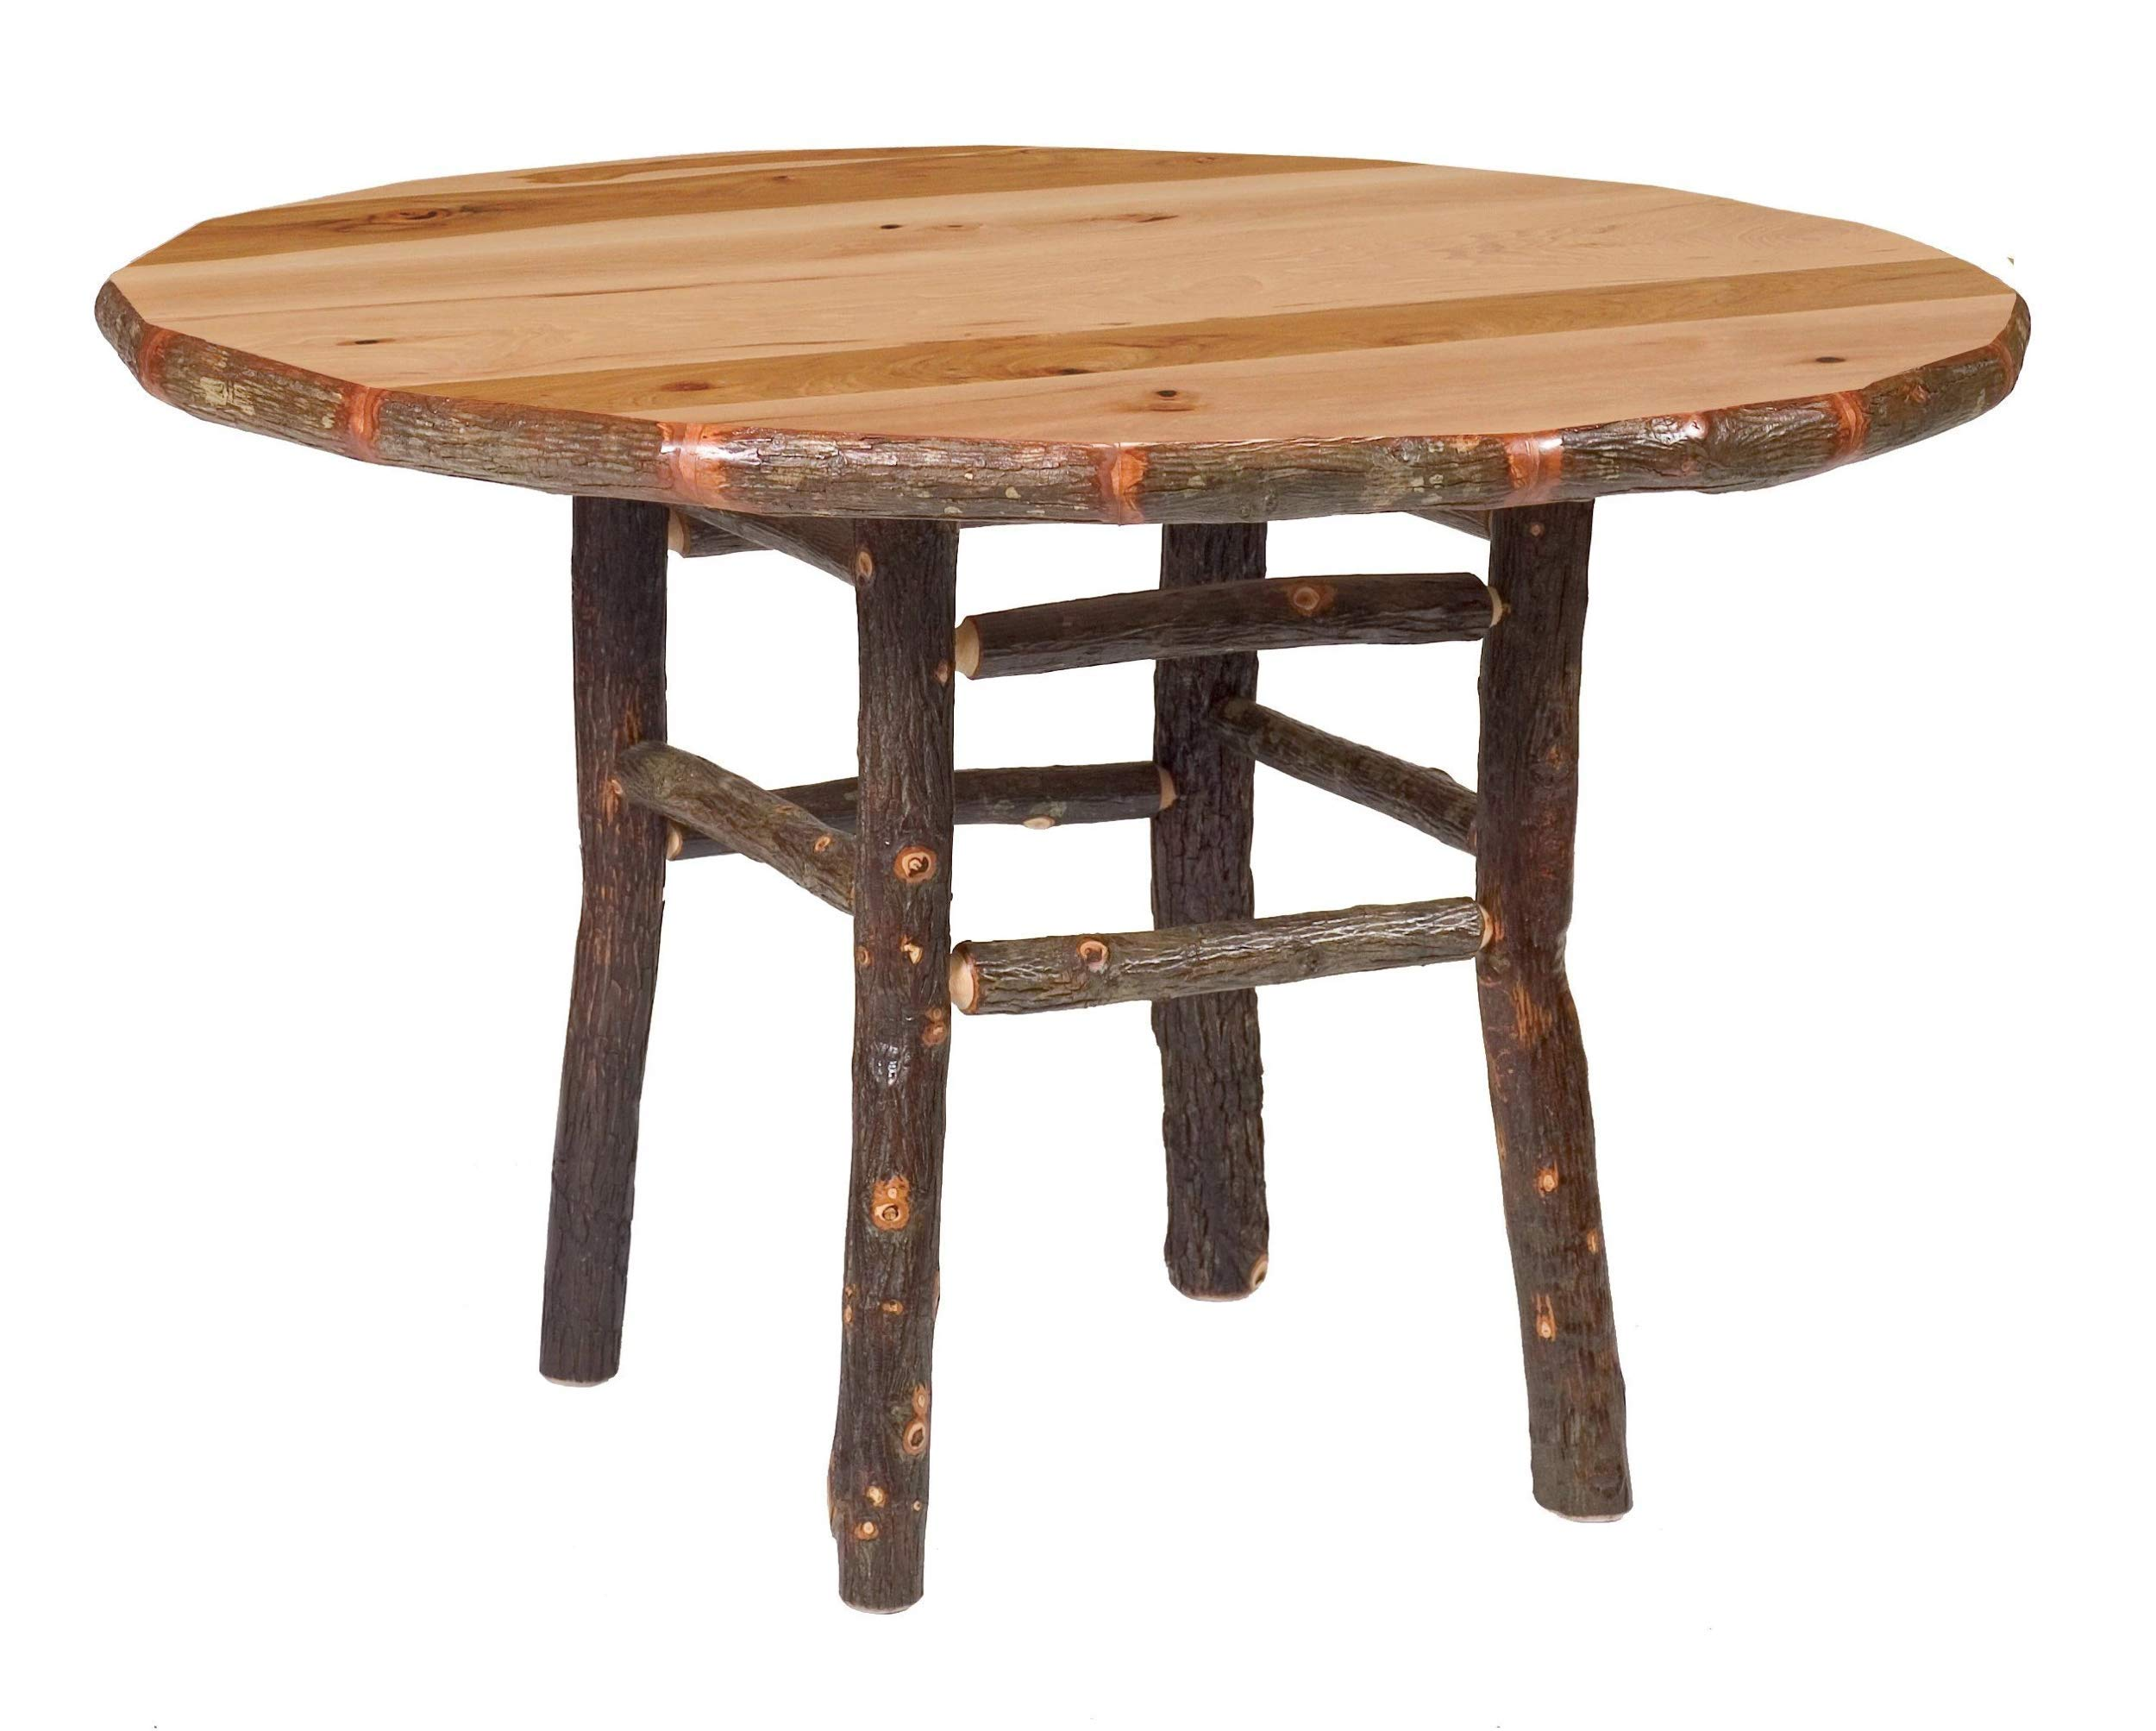 Genuine Hickory Log Round Dining Table - Custom Sizes Handmade USA by Fireside Lodge